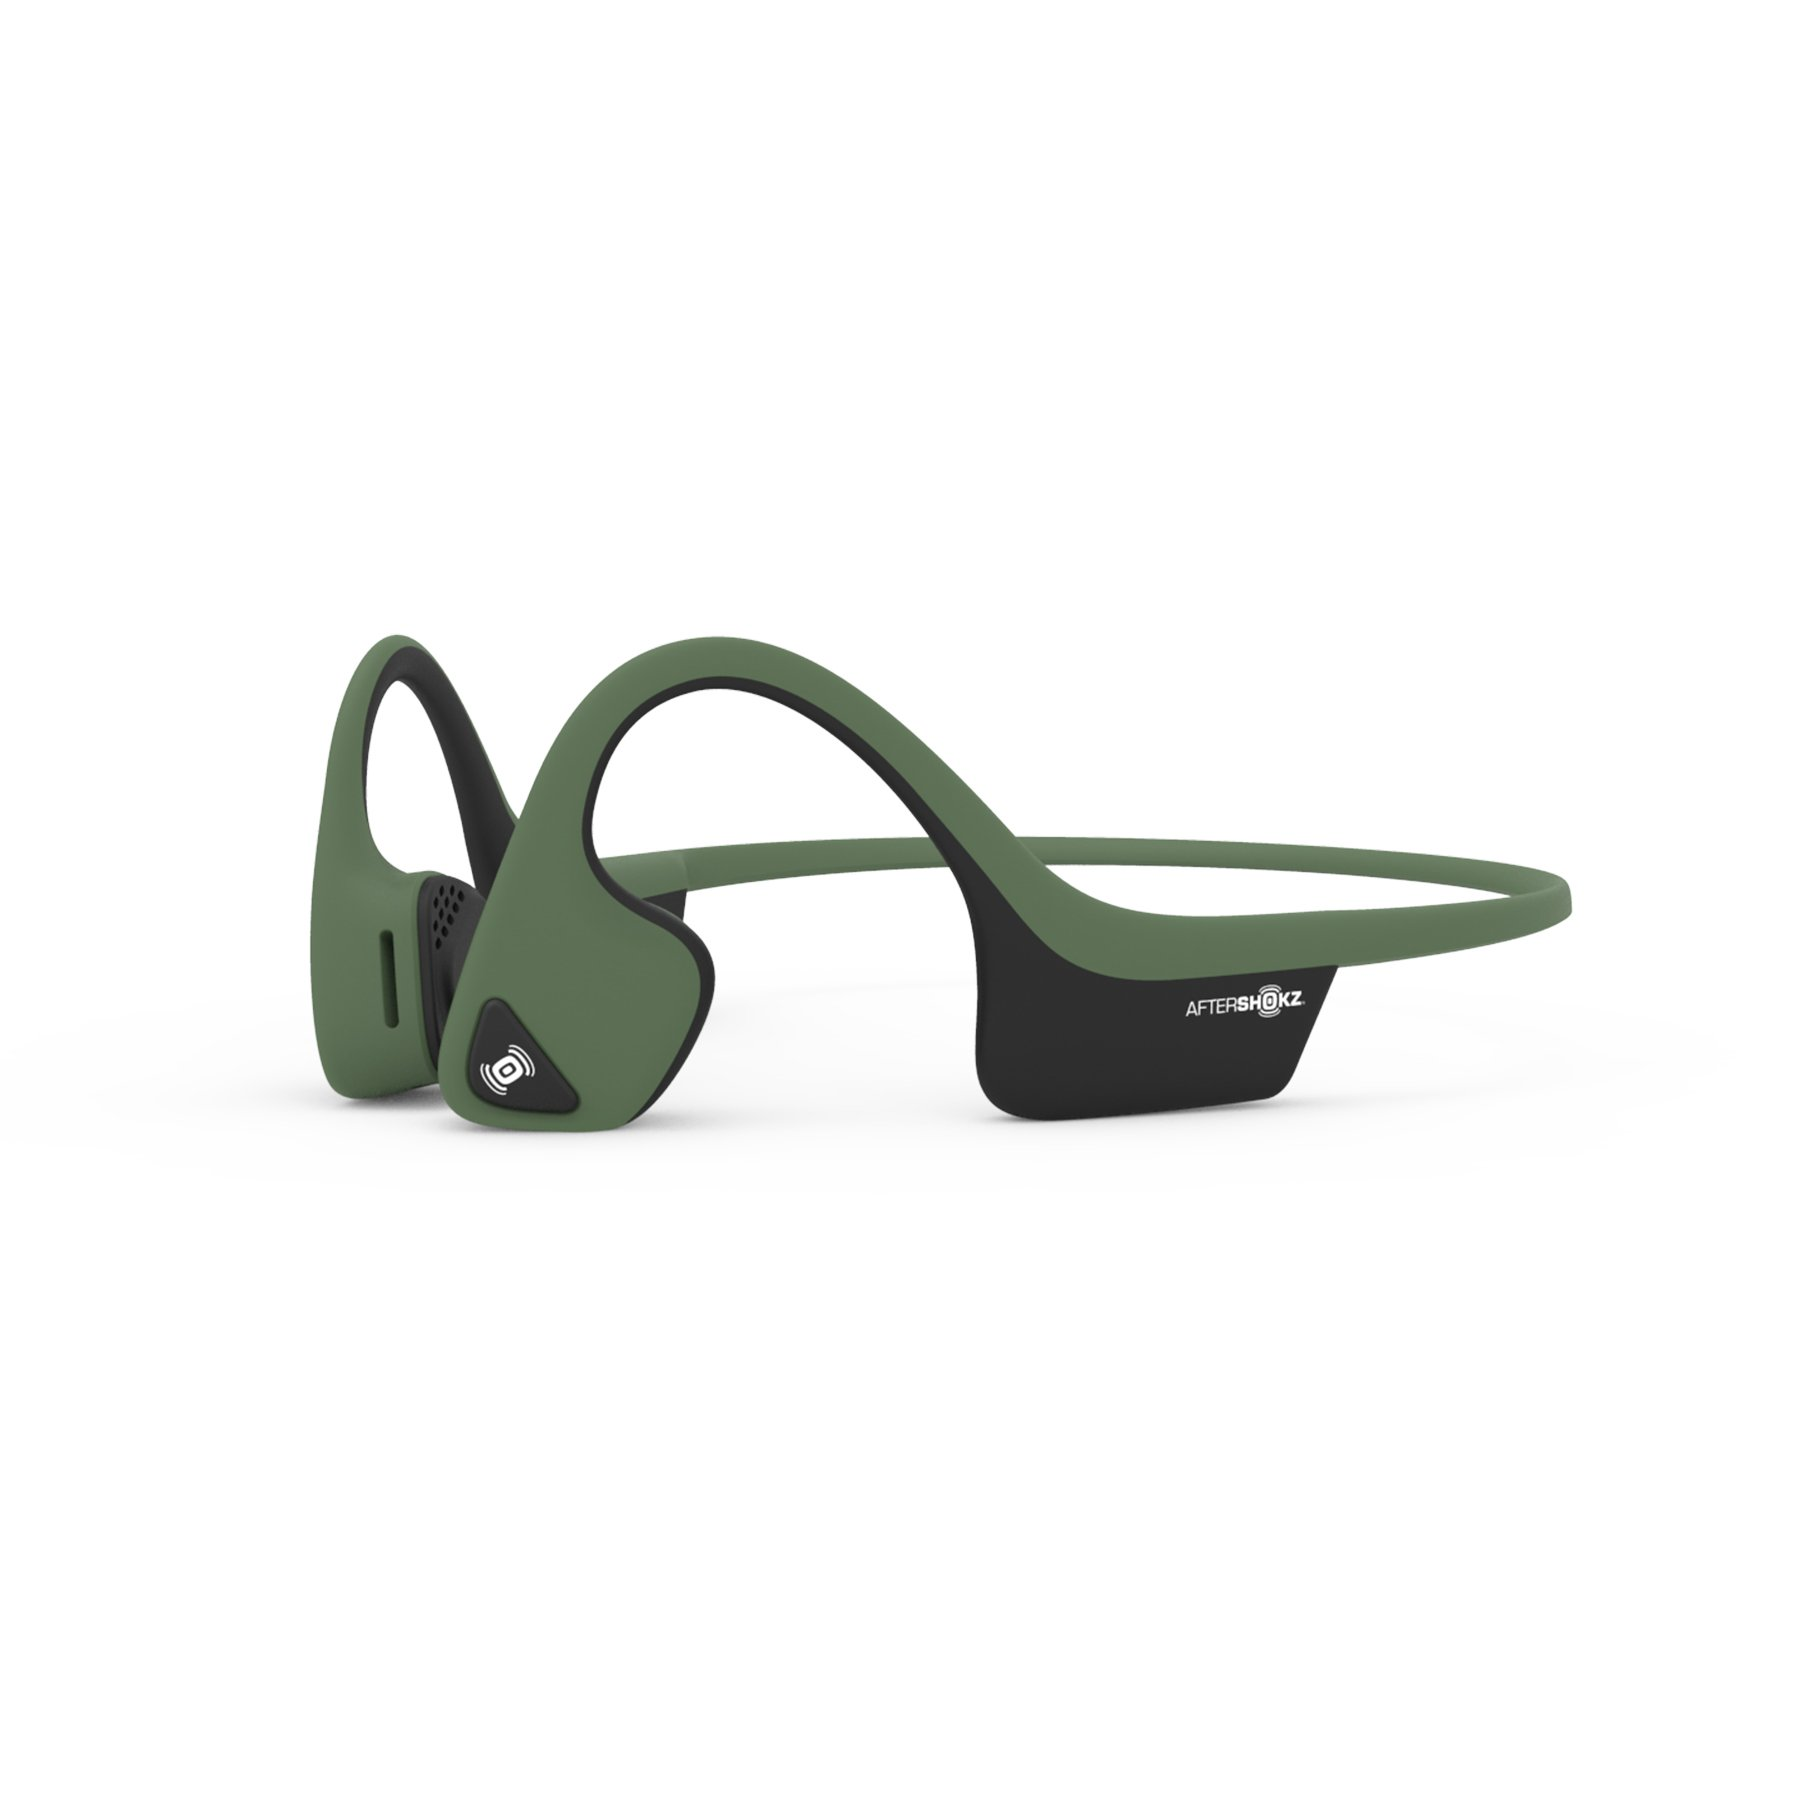 AfterShokz Air Open Ear Wireless Bone Conduction Headphones, Forest Green, AS650FG by Aftershokz